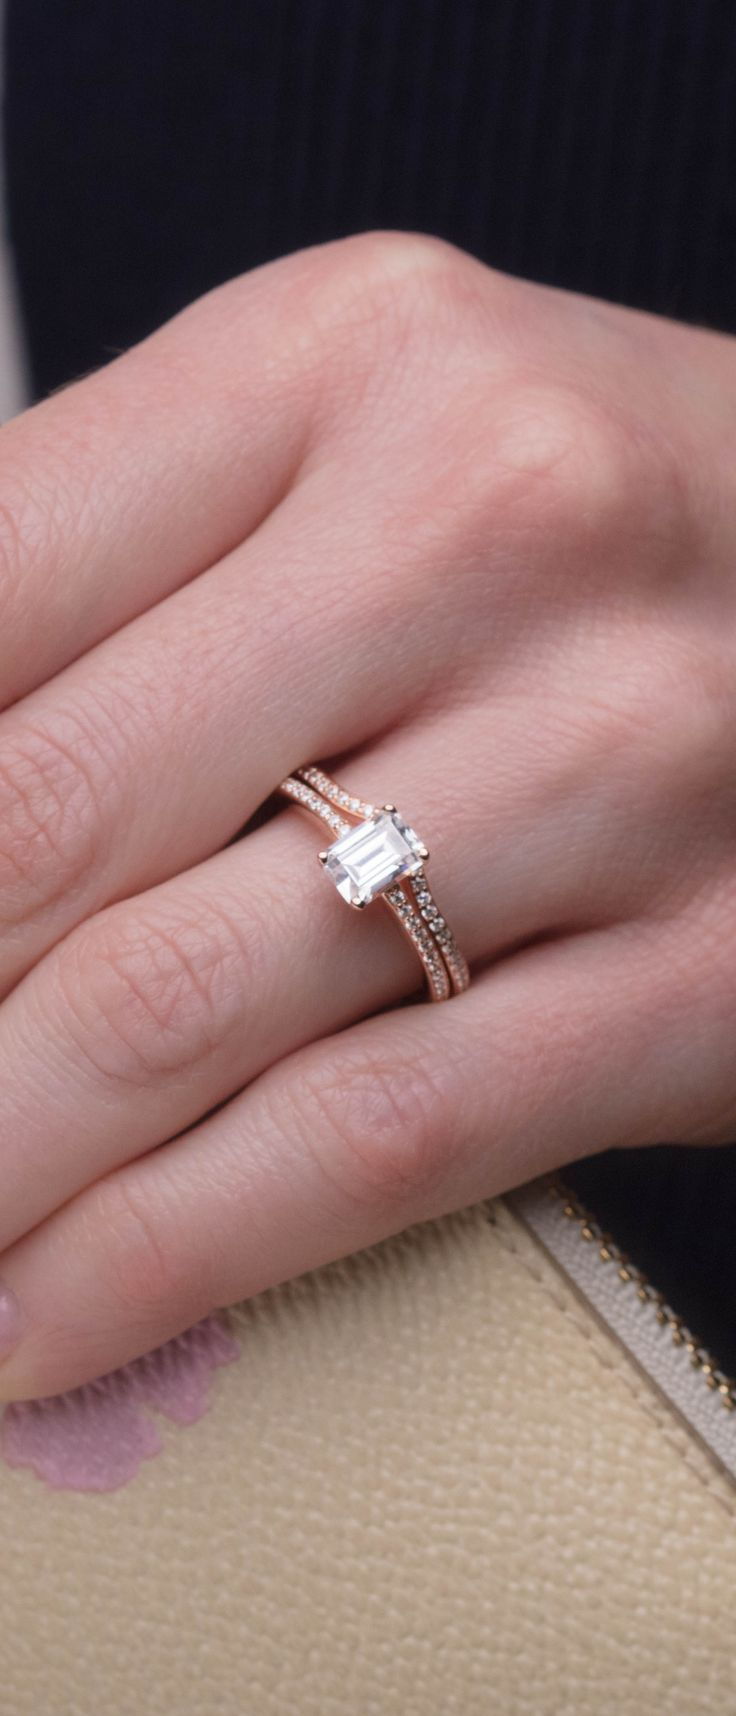 230 best Engagement Rings images on Pinterest | Diamond engagement ...